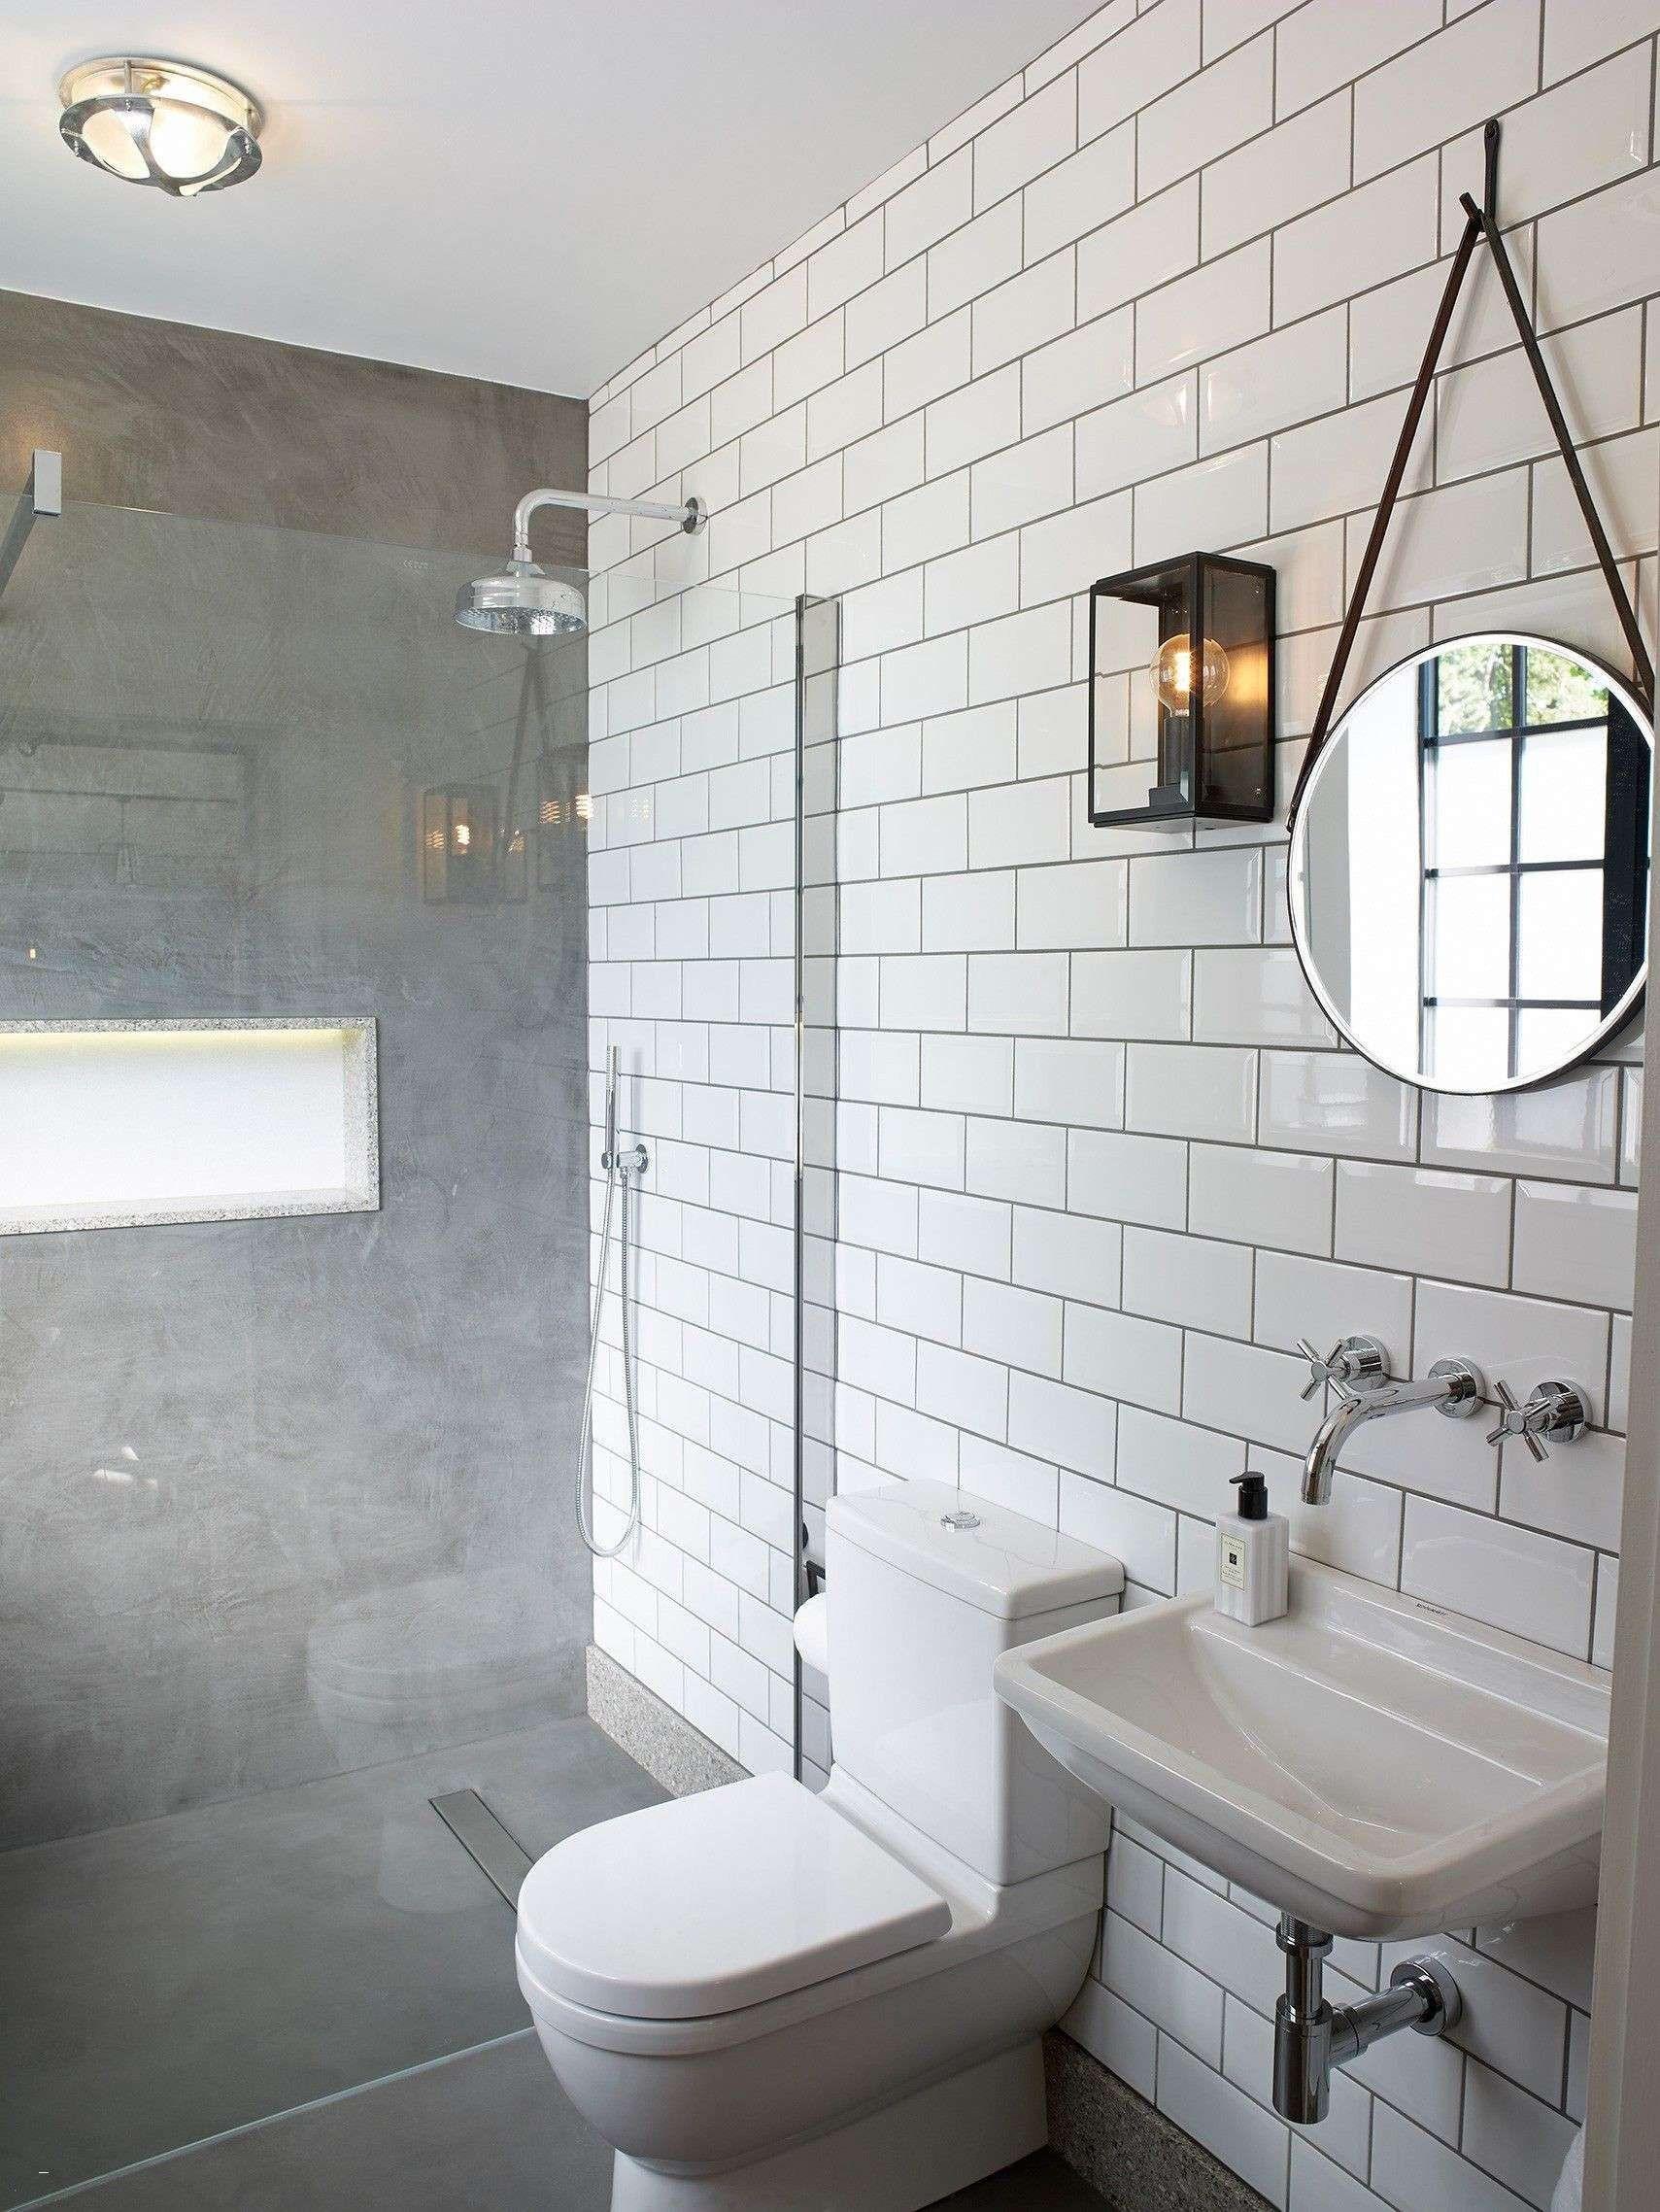 Coastal Wall Decor Ideas Awesome 40 Unique Bathroom Decor Ideas Beach Bathroom Layout Bathrooms Remodel Bathroom Decor